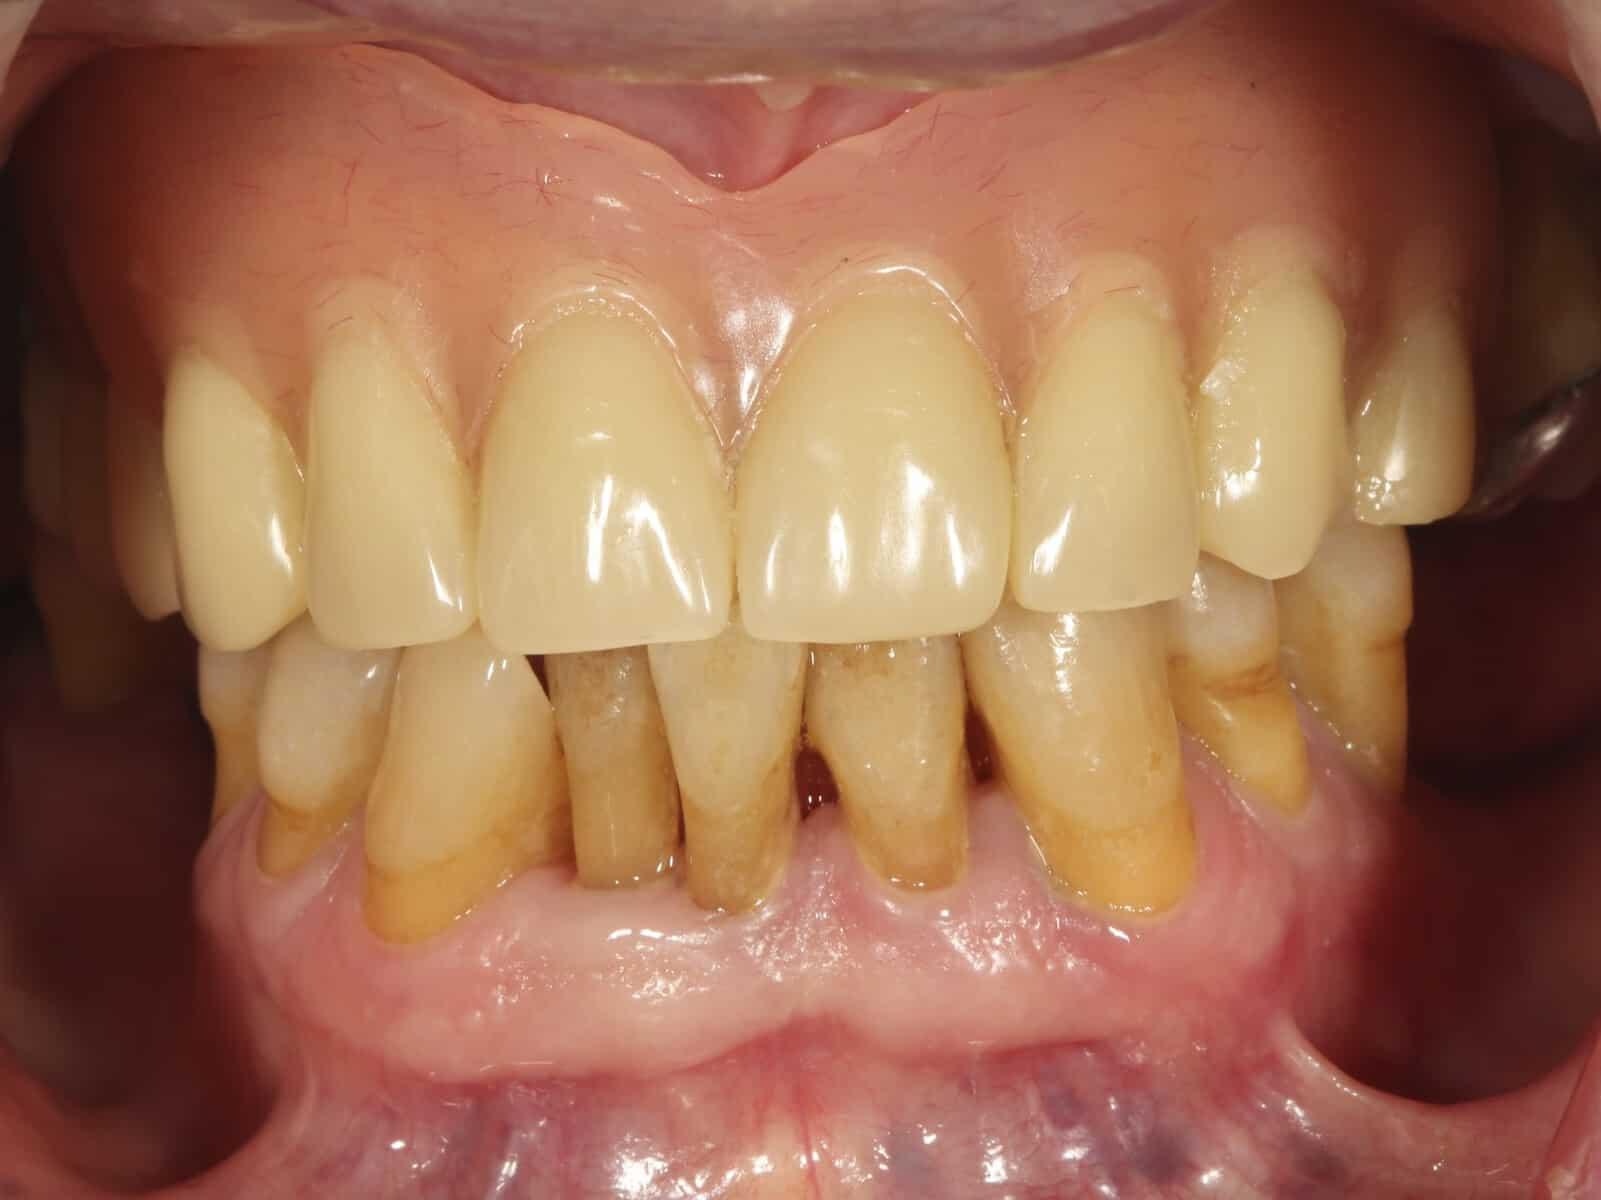 ArtLab Dental - Fernando - Following upper dental implant